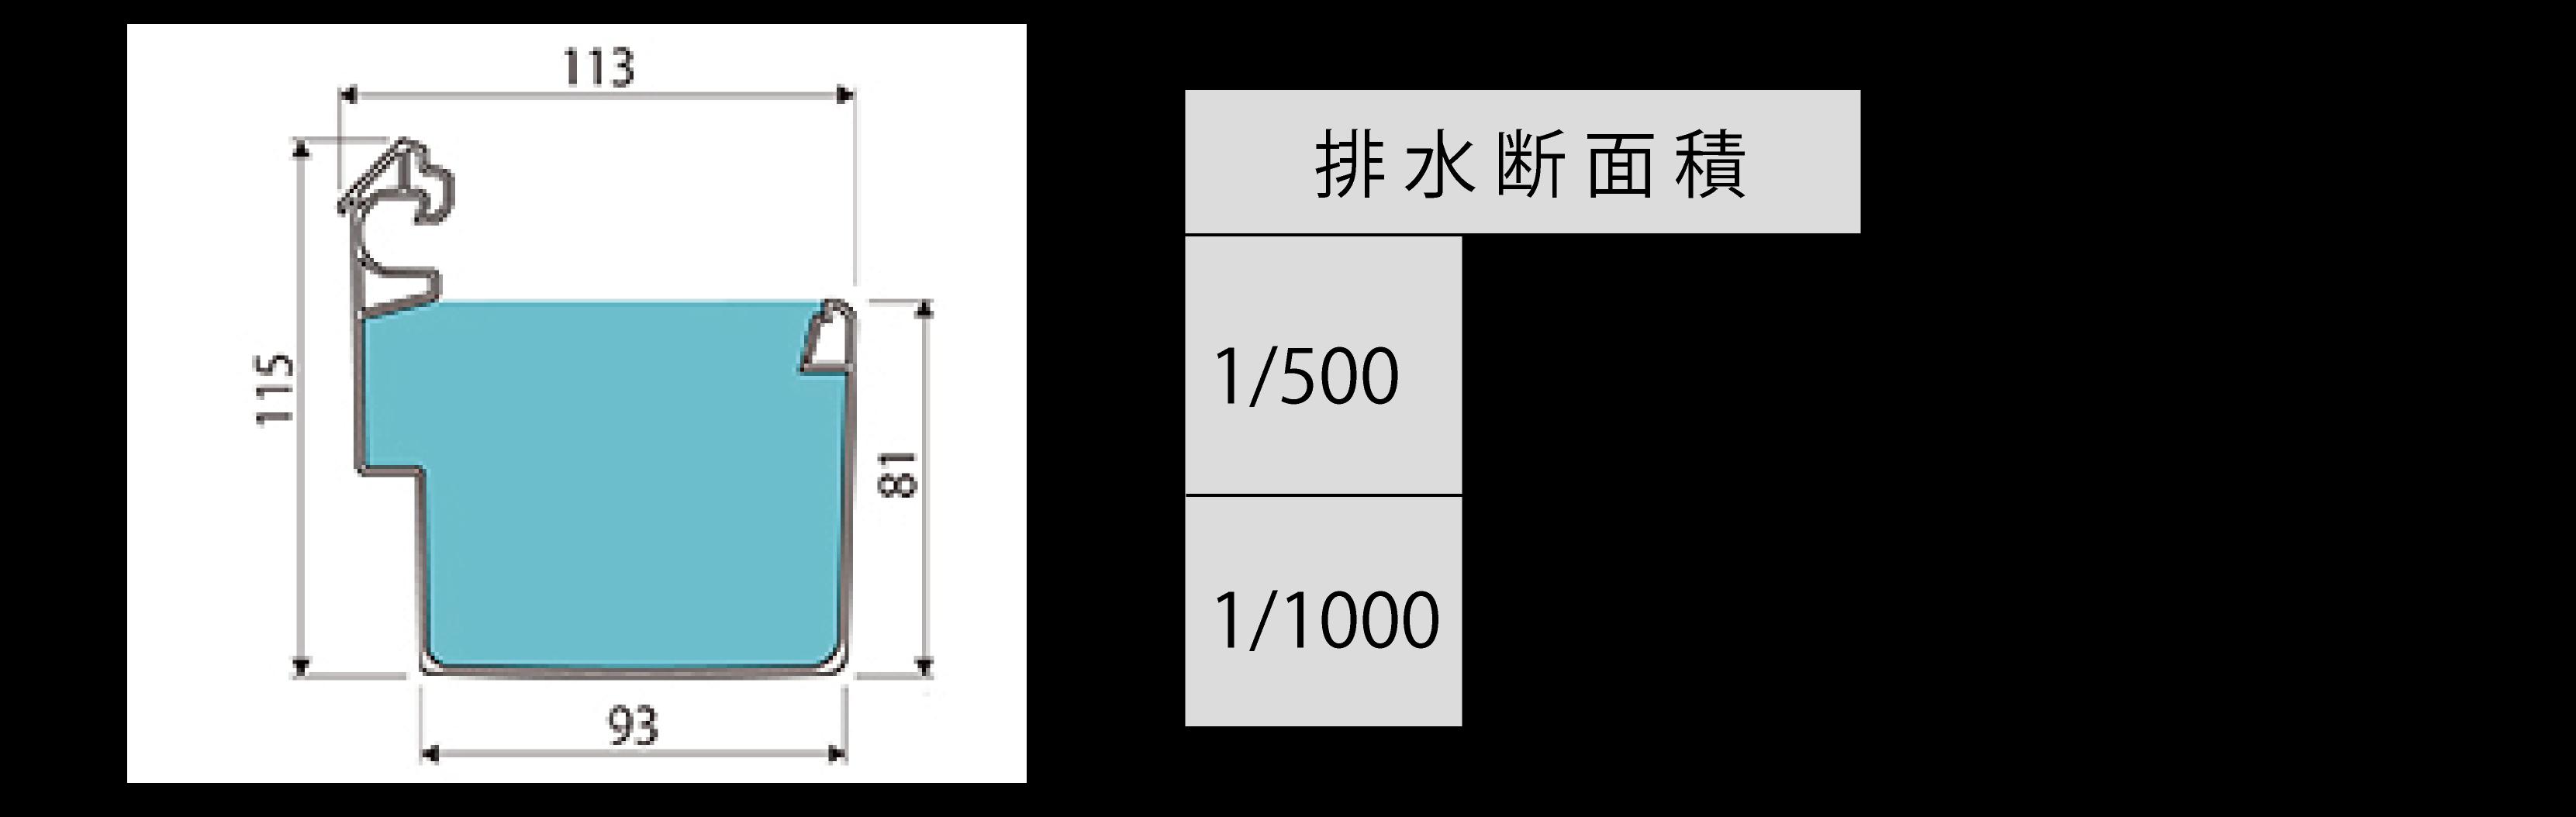 超芯LEVOL4-03